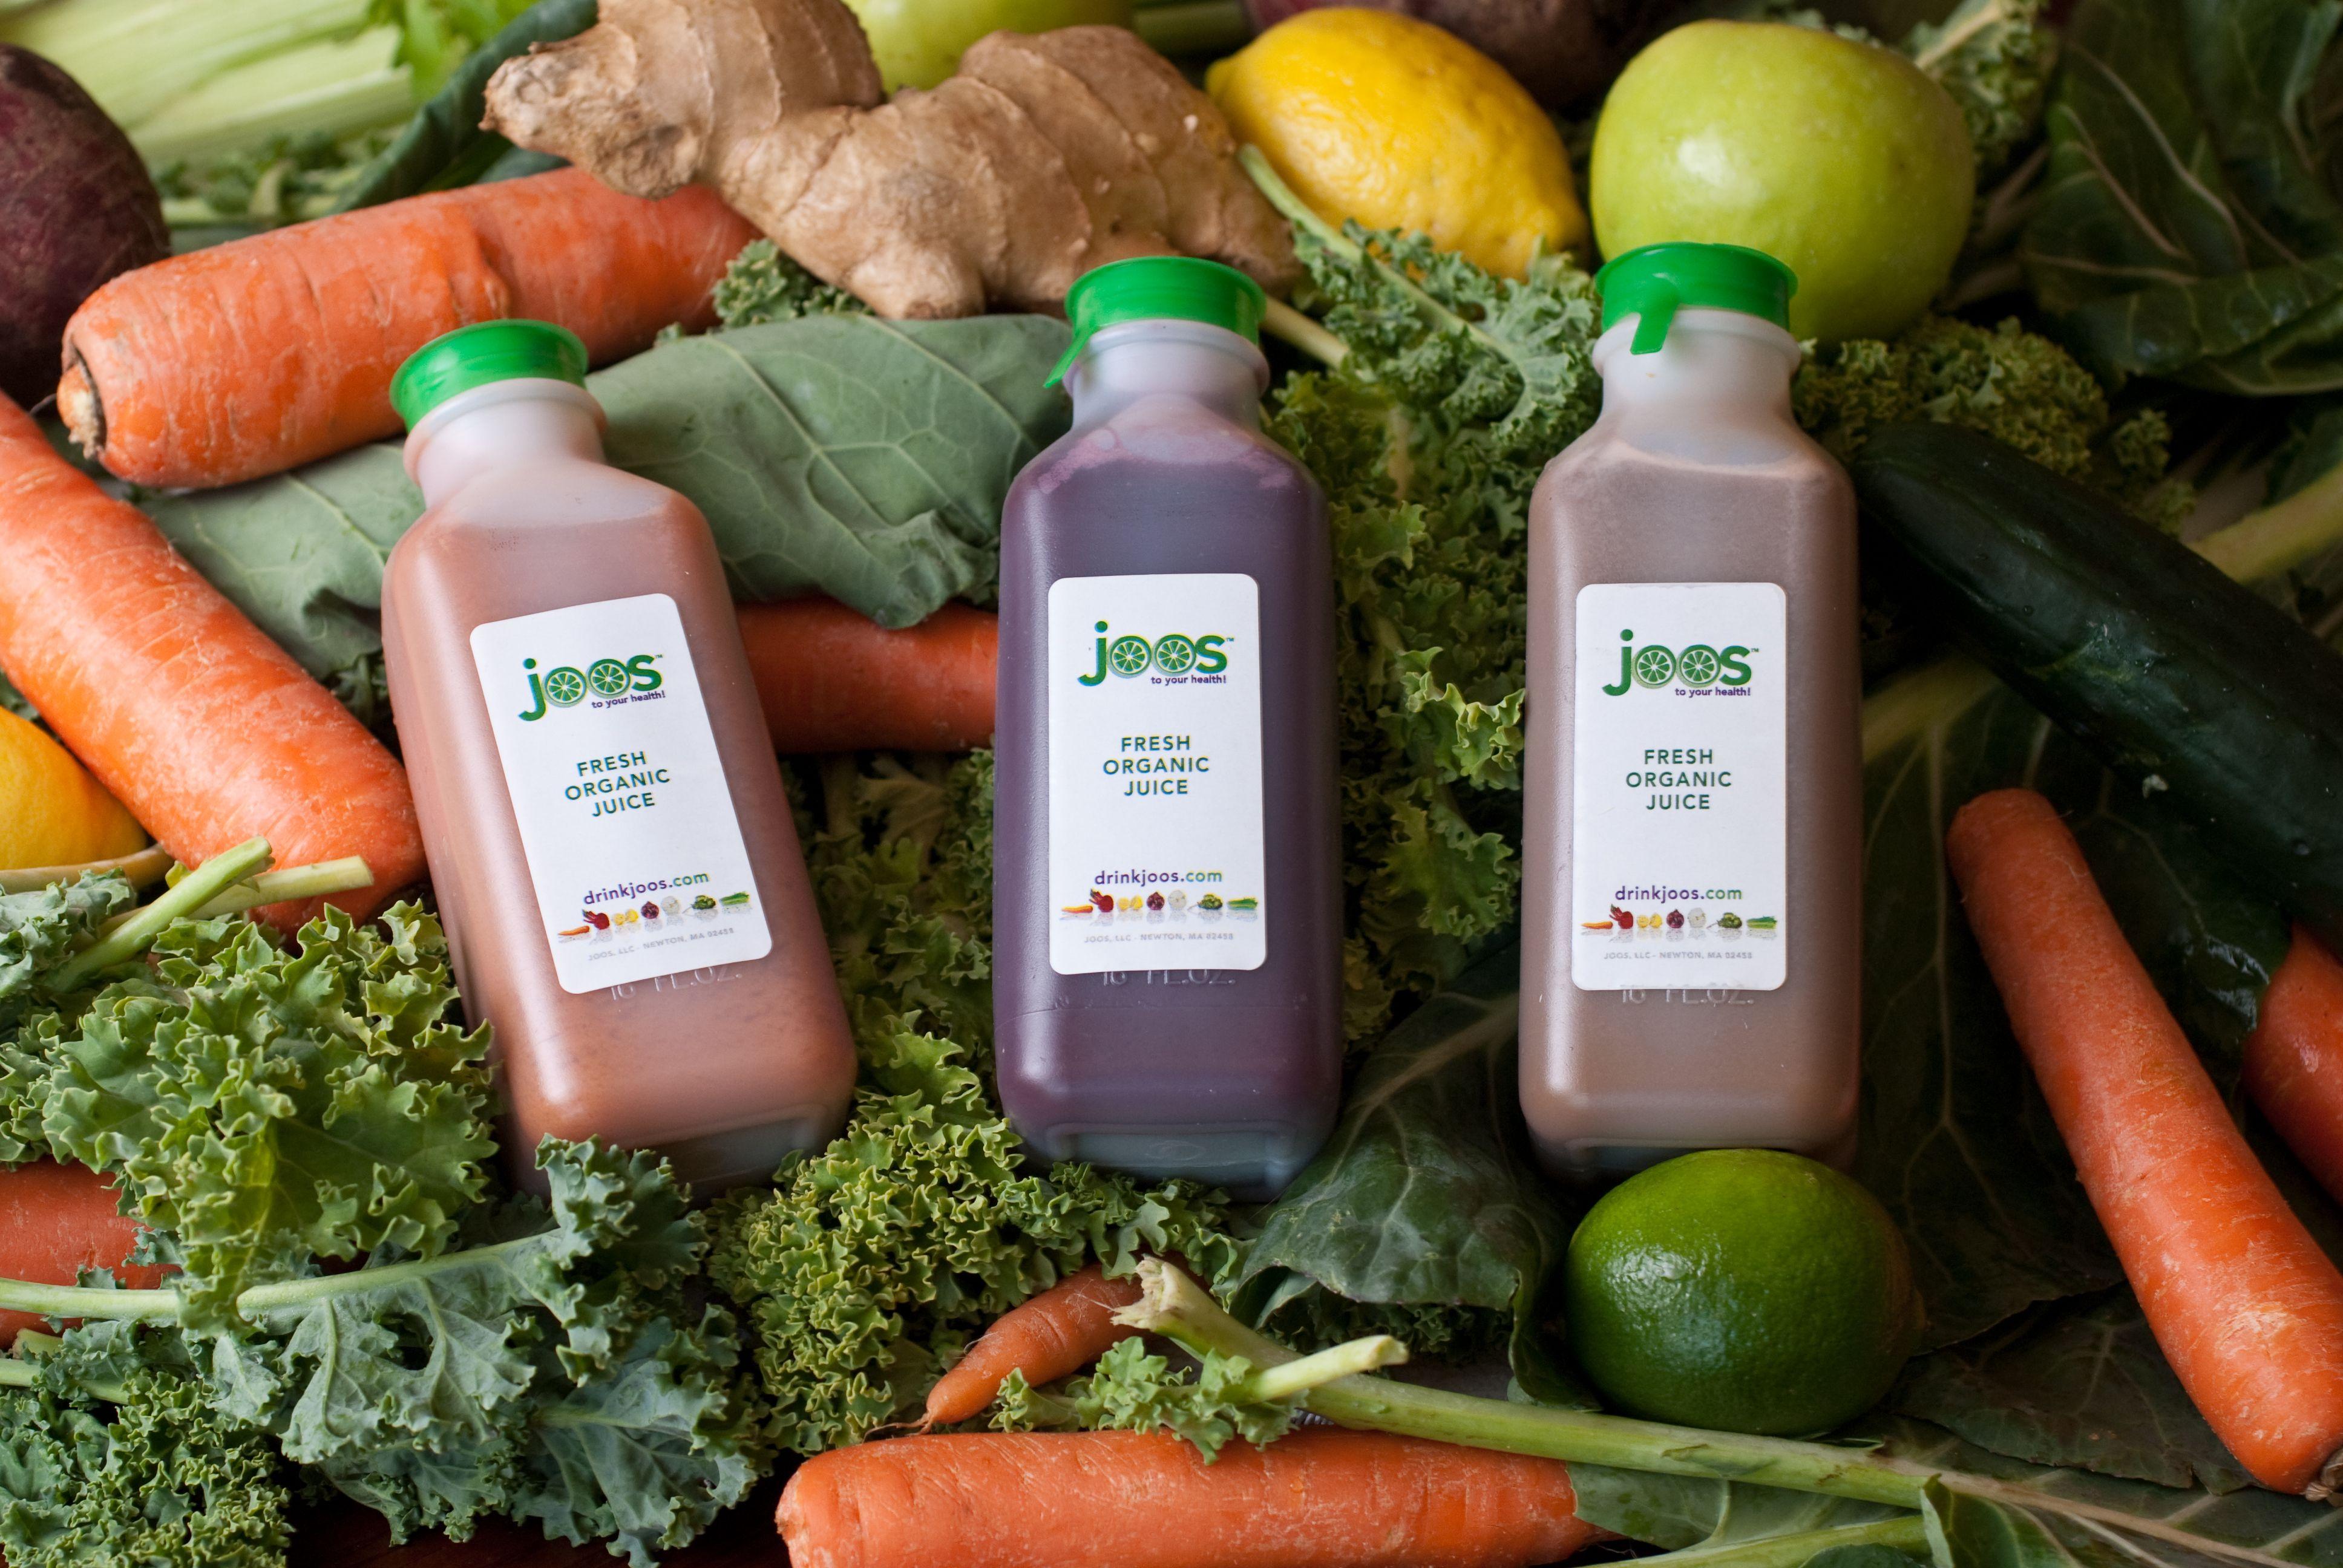 Fresh organic juices make you come alive organic juice